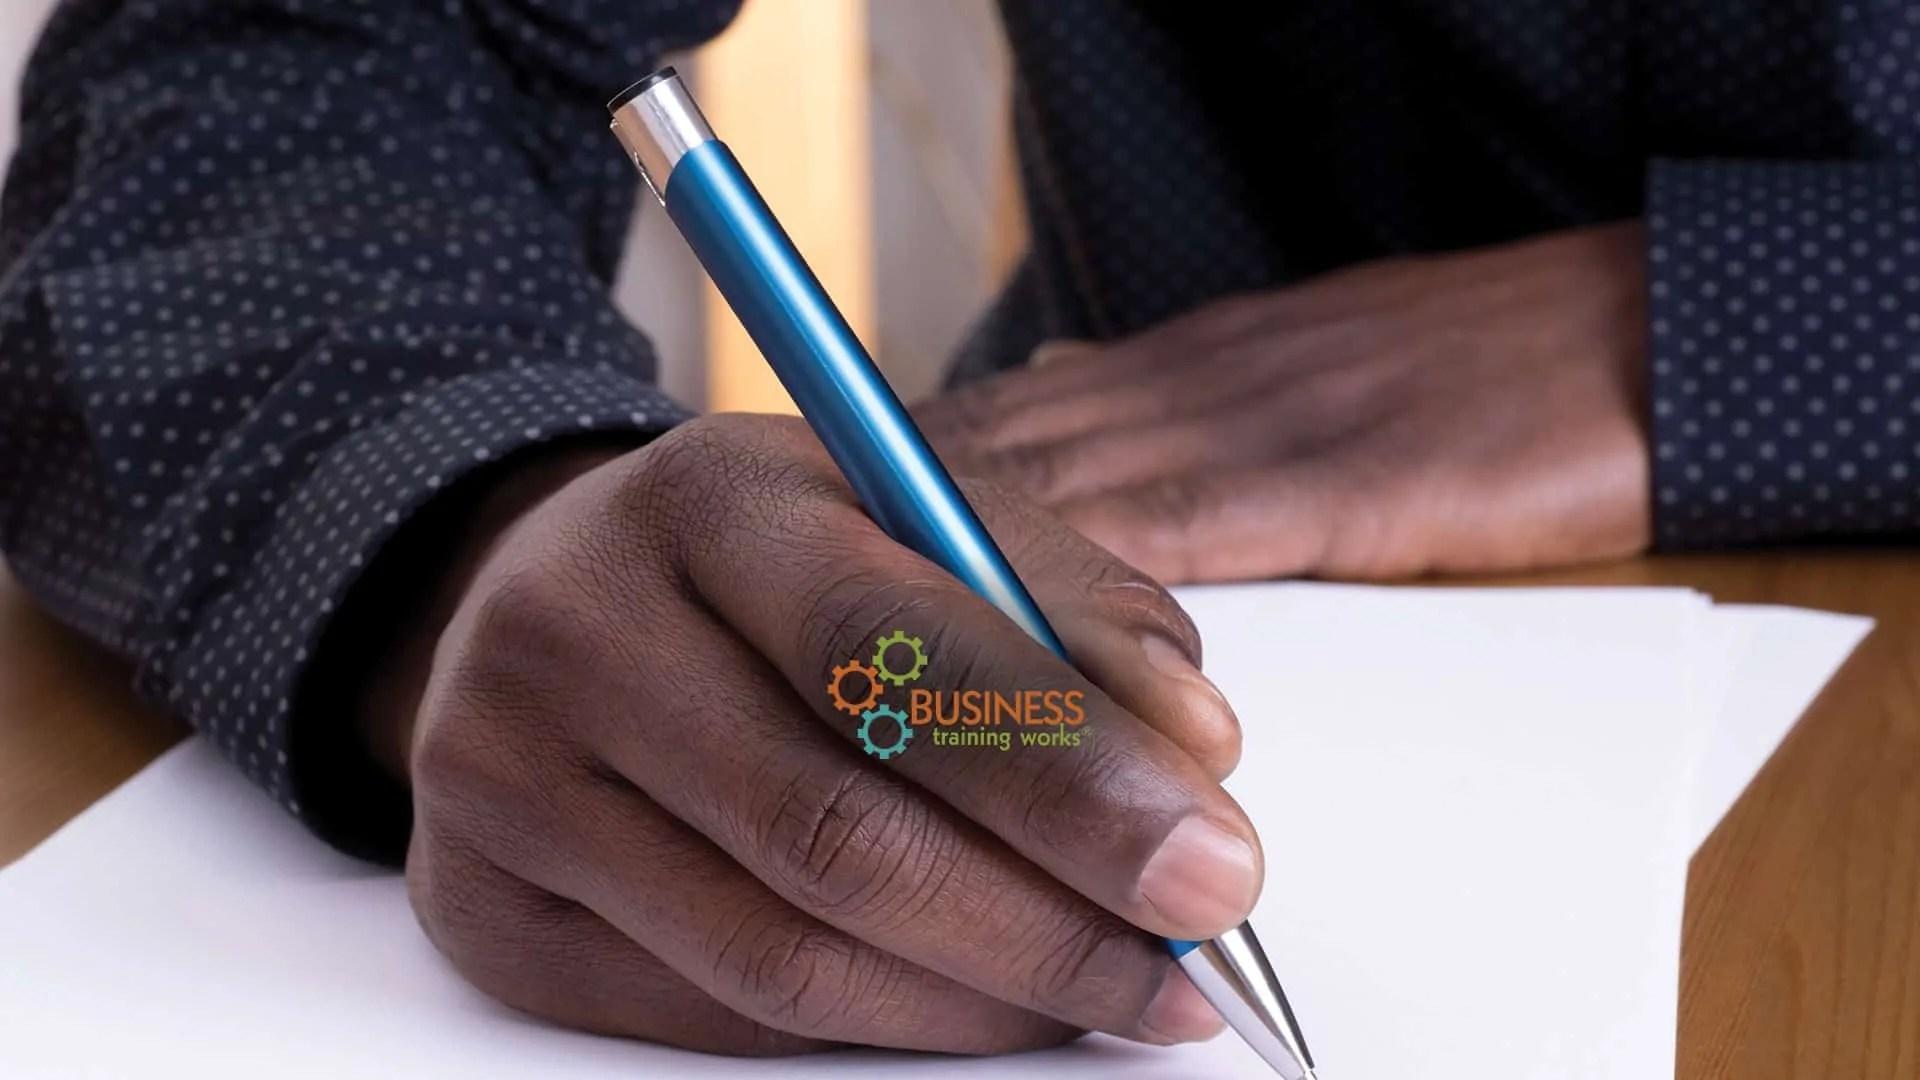 Web-Based-Business Writing Course